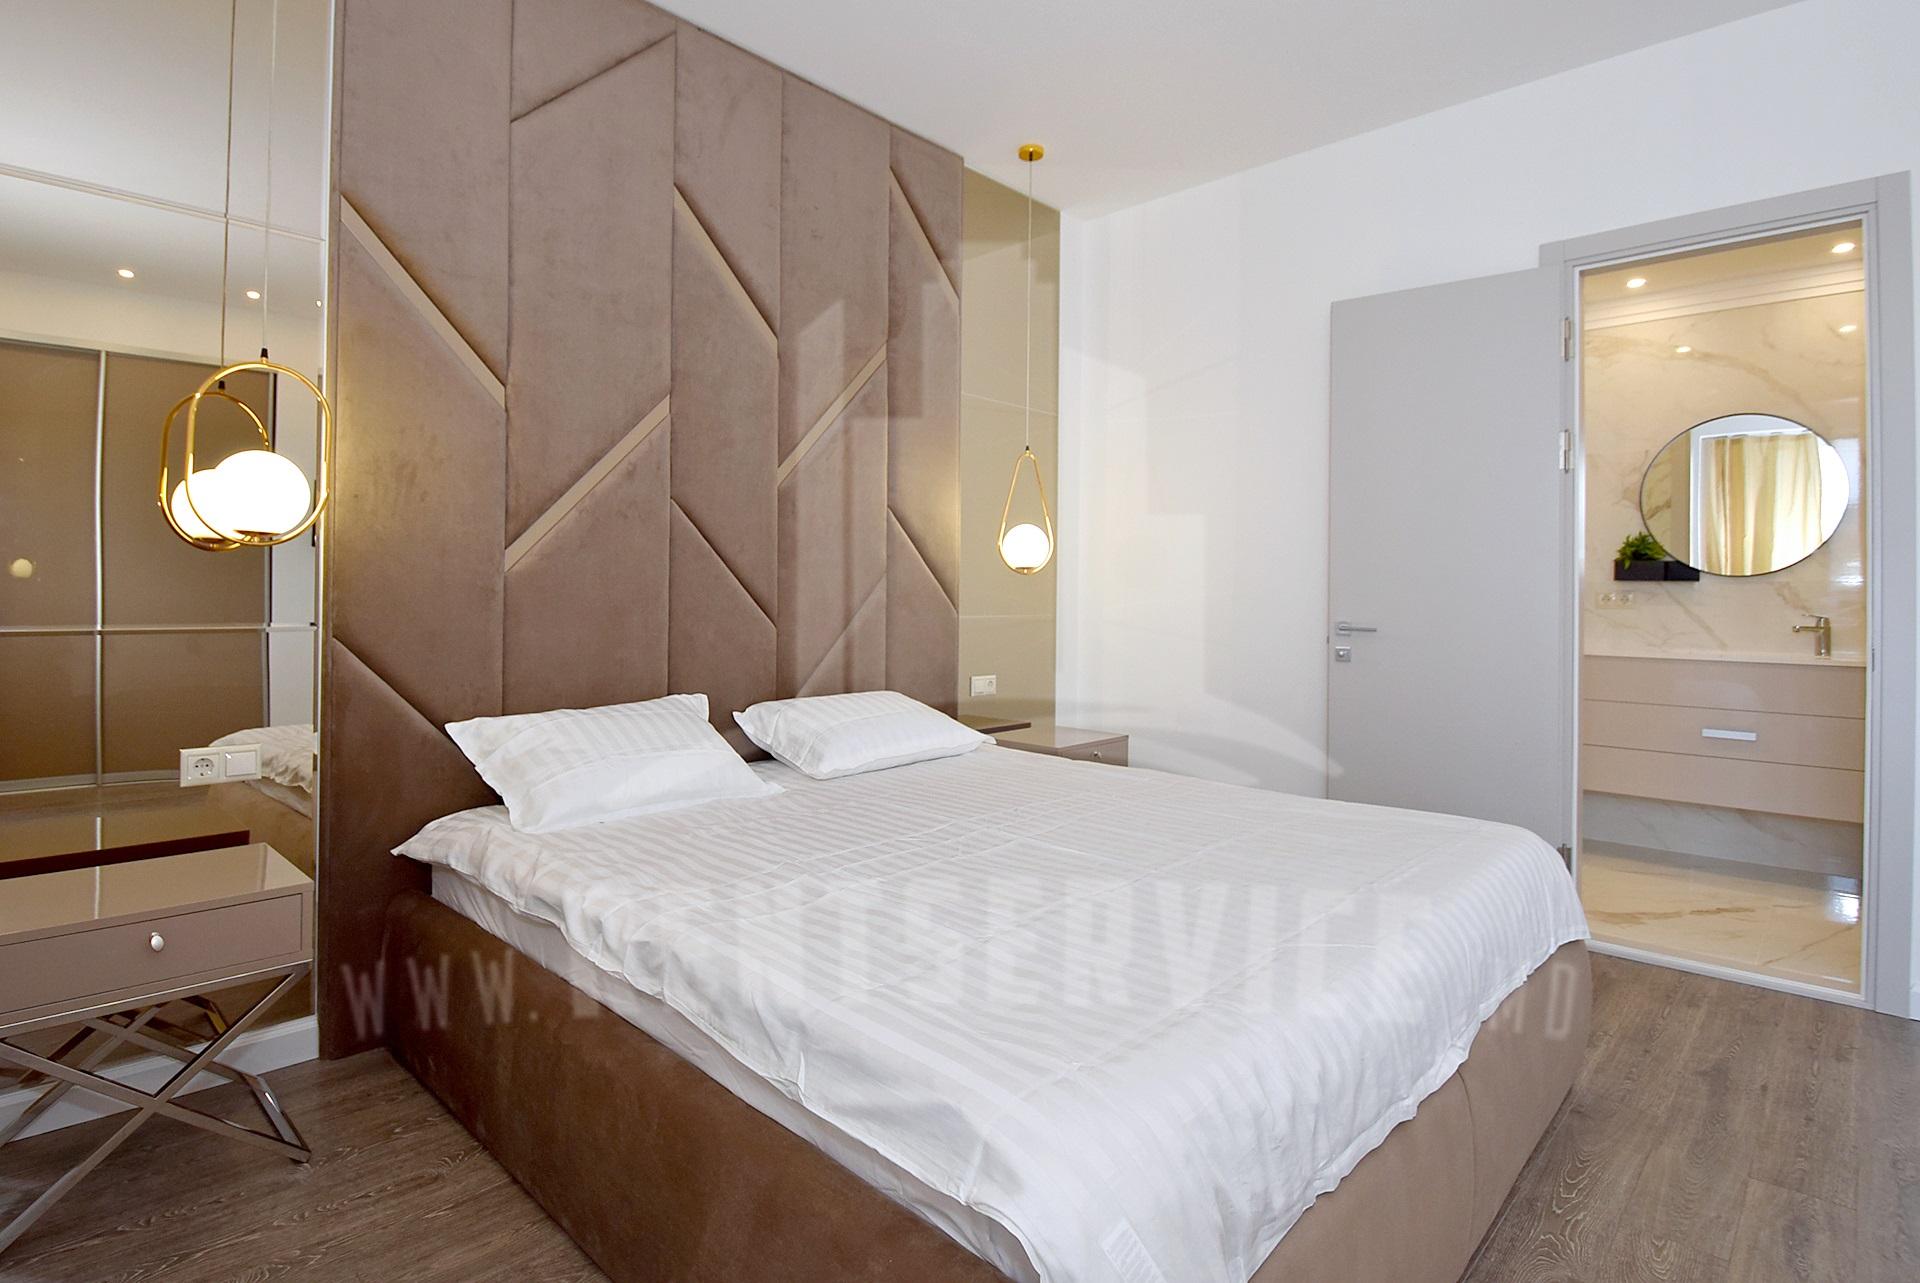 285_apartment_12.JPG